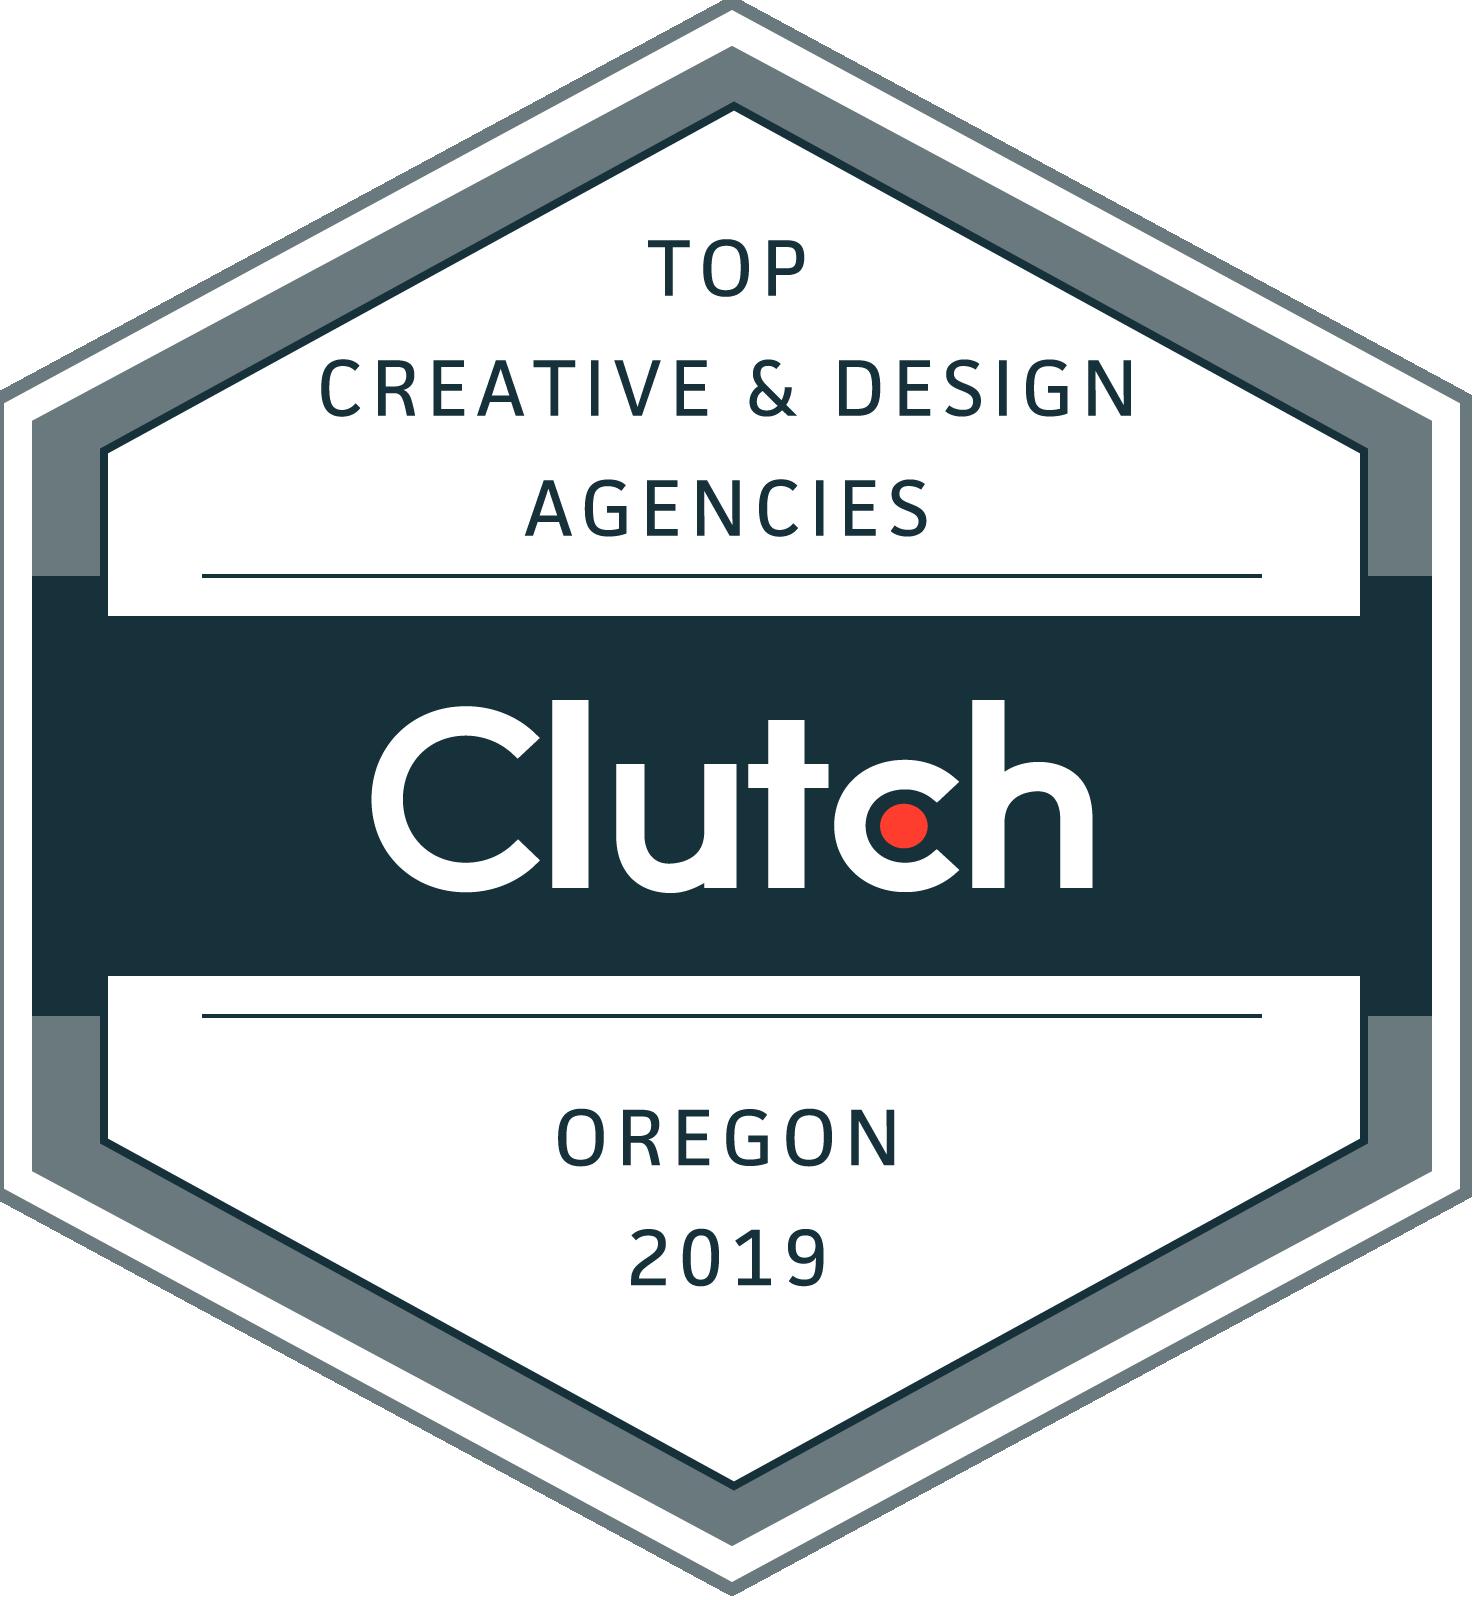 Oregon_Creative___Design_2019.png